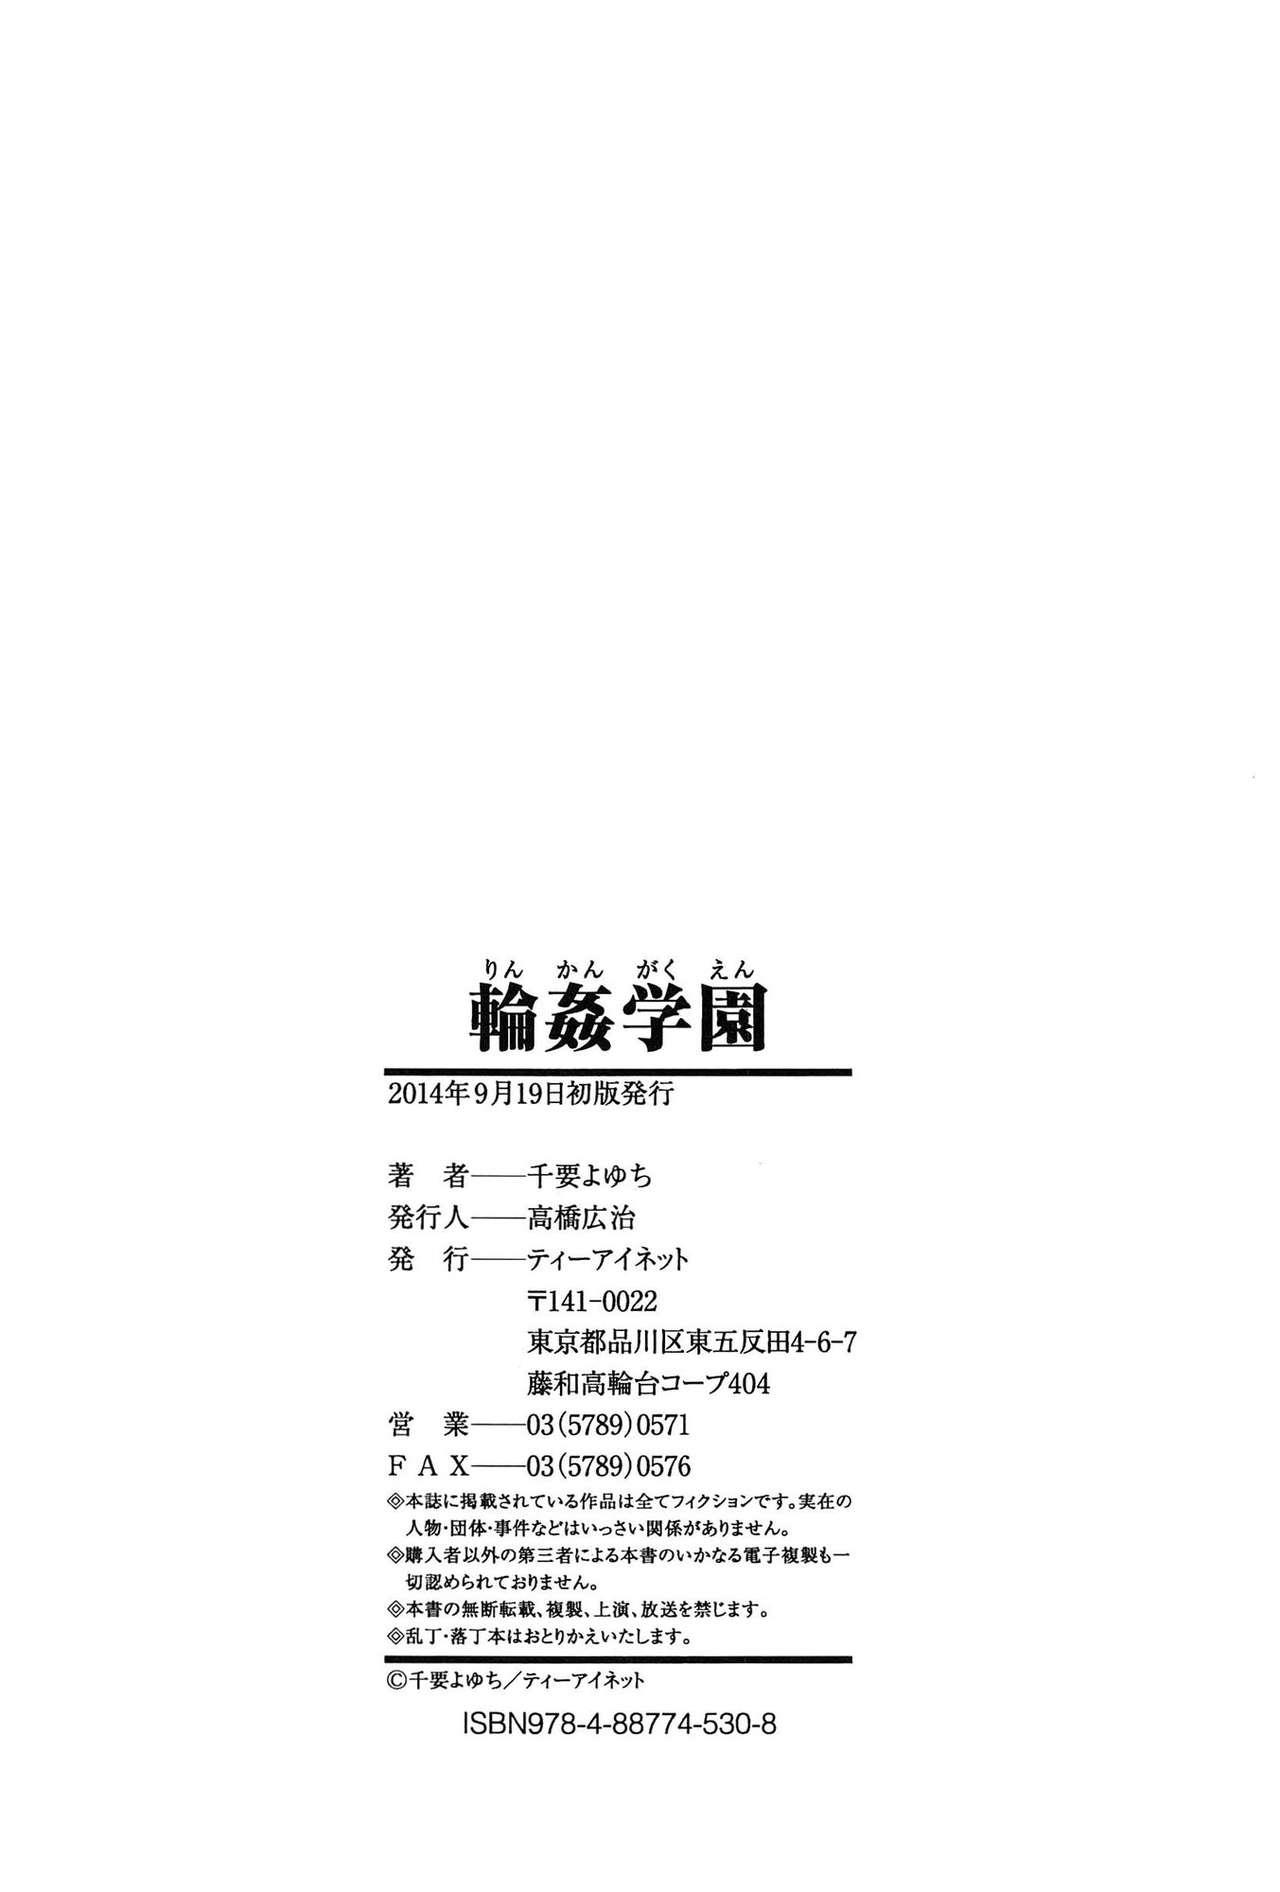 [Chiyou Yoyuchi] Rinkan Gakuen ~Haibokusha-tachi wa Midaremau~   Gang Rape School: The Losers Dance Indecently [English] 207